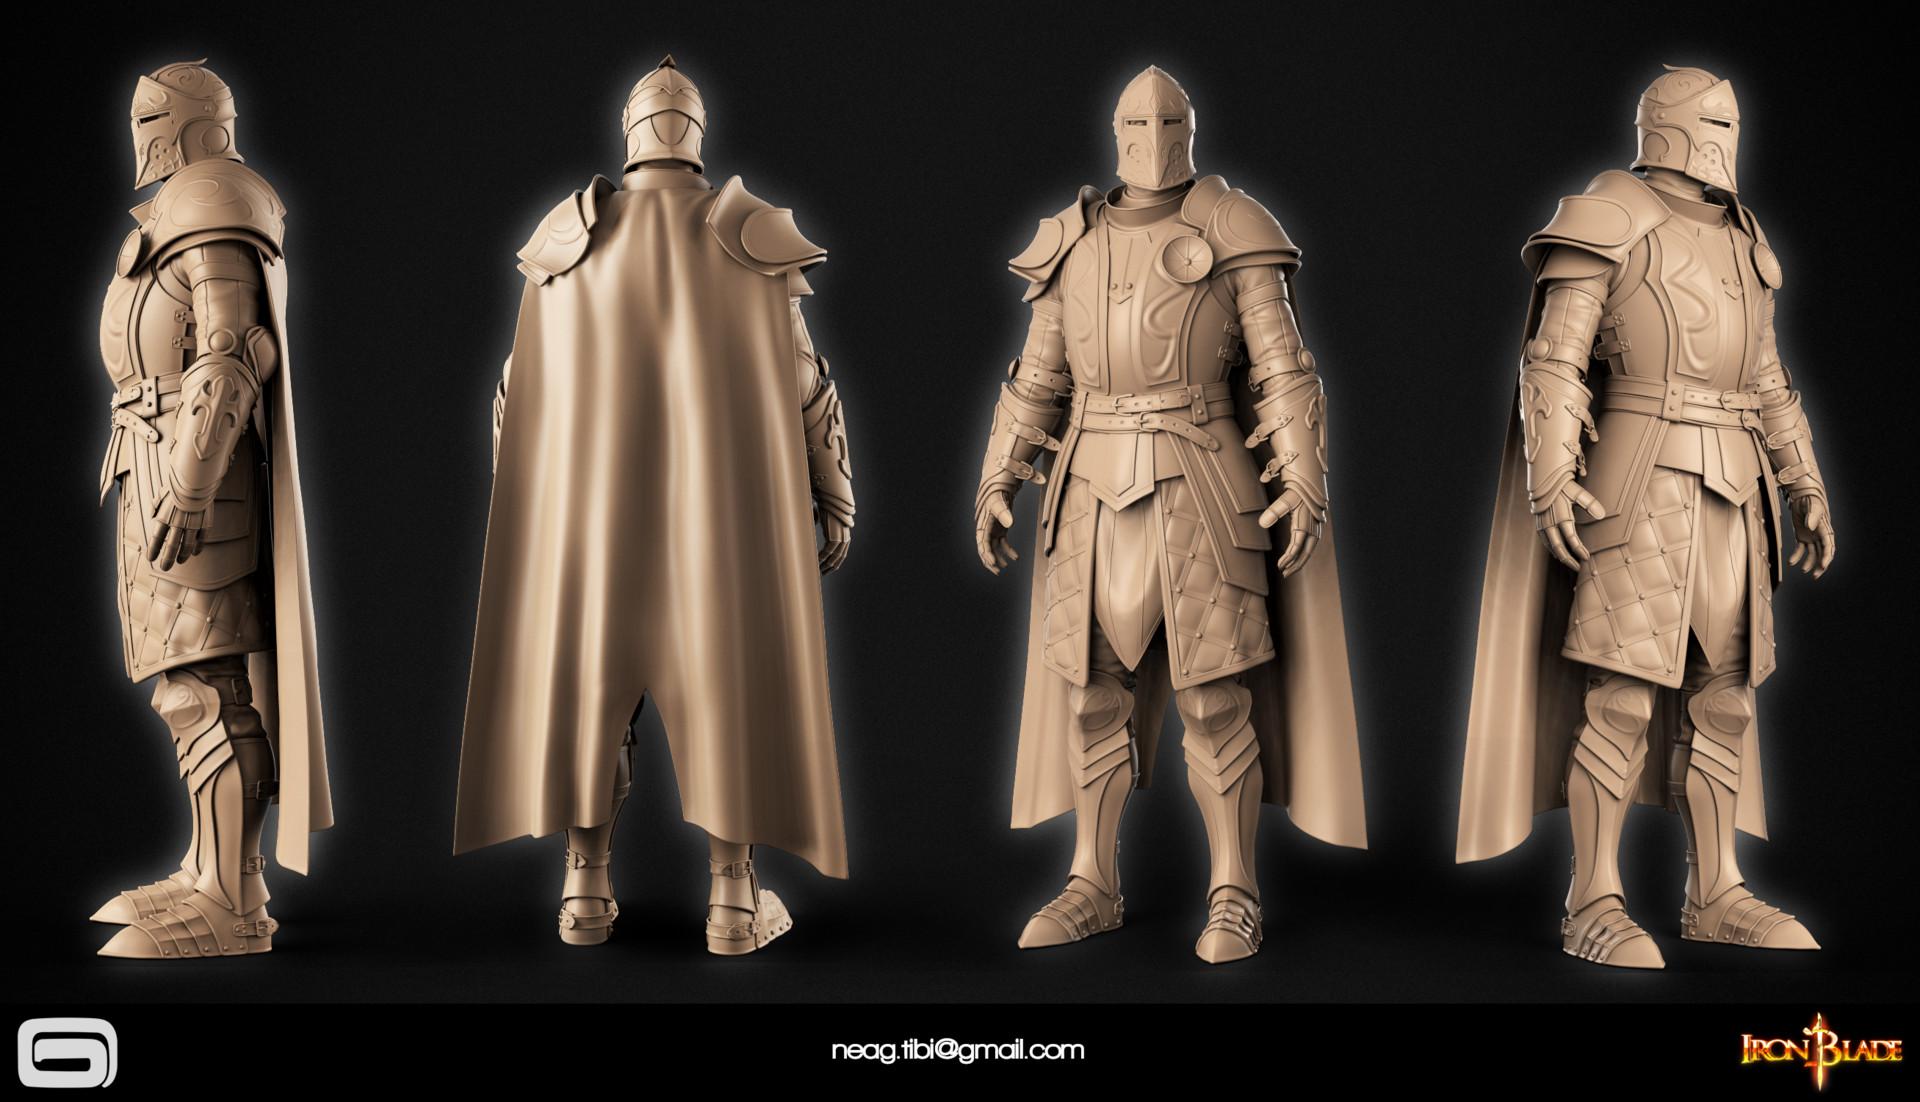 Tibi neag tibi neag iron blade mc armor 14b high poly